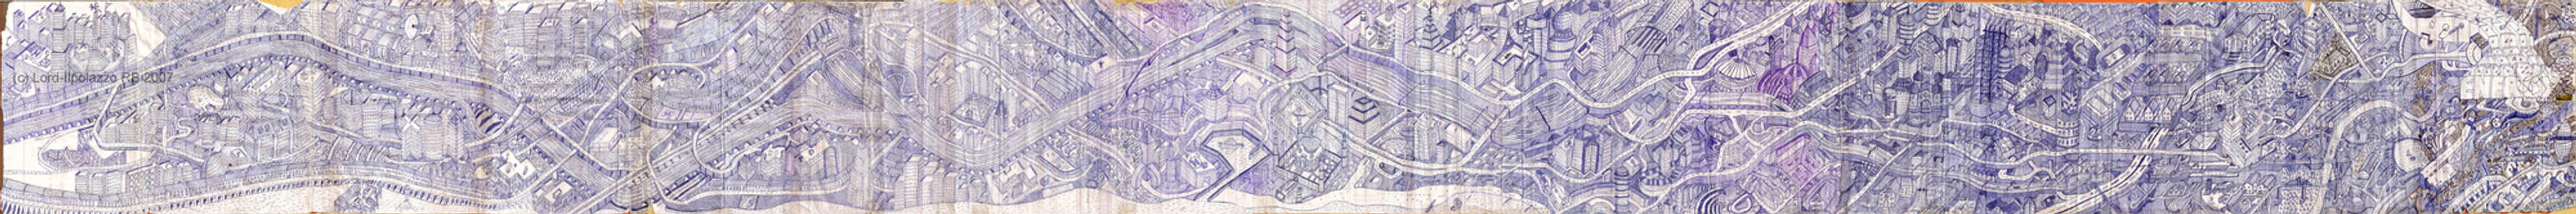 The City by Lord-Ilpolazzo